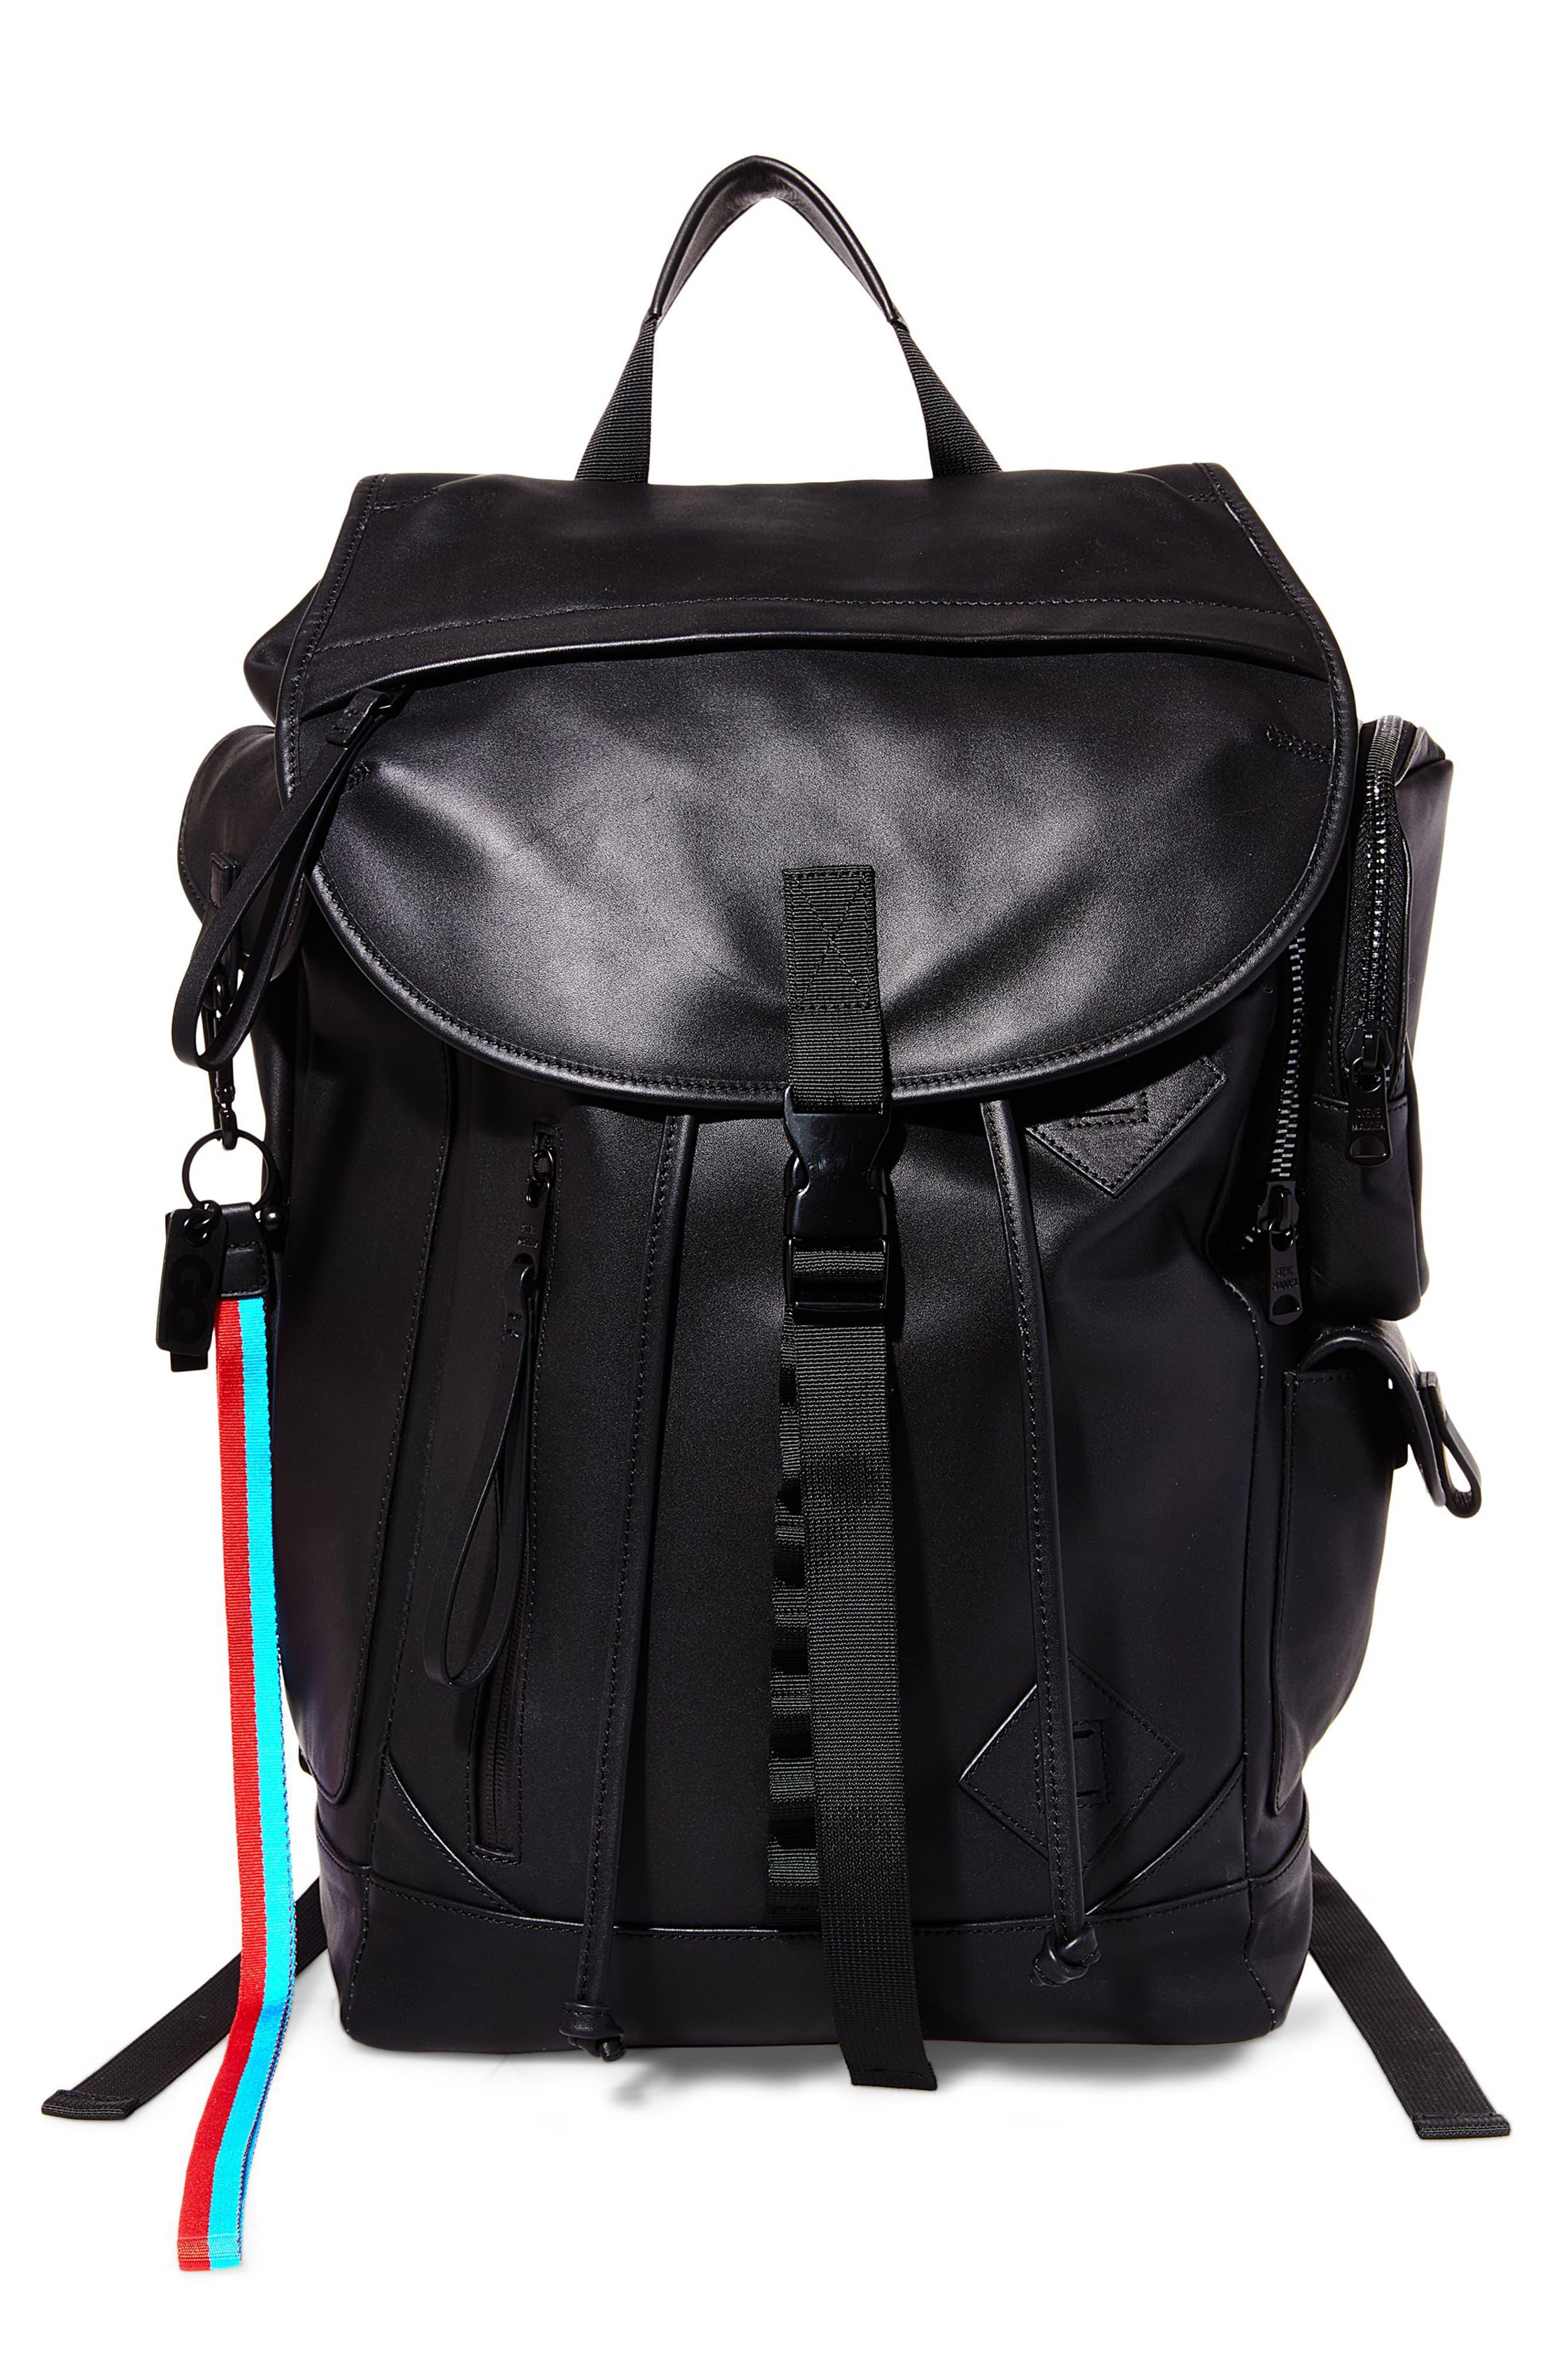 GQ x Steve Madden Leather Backpack